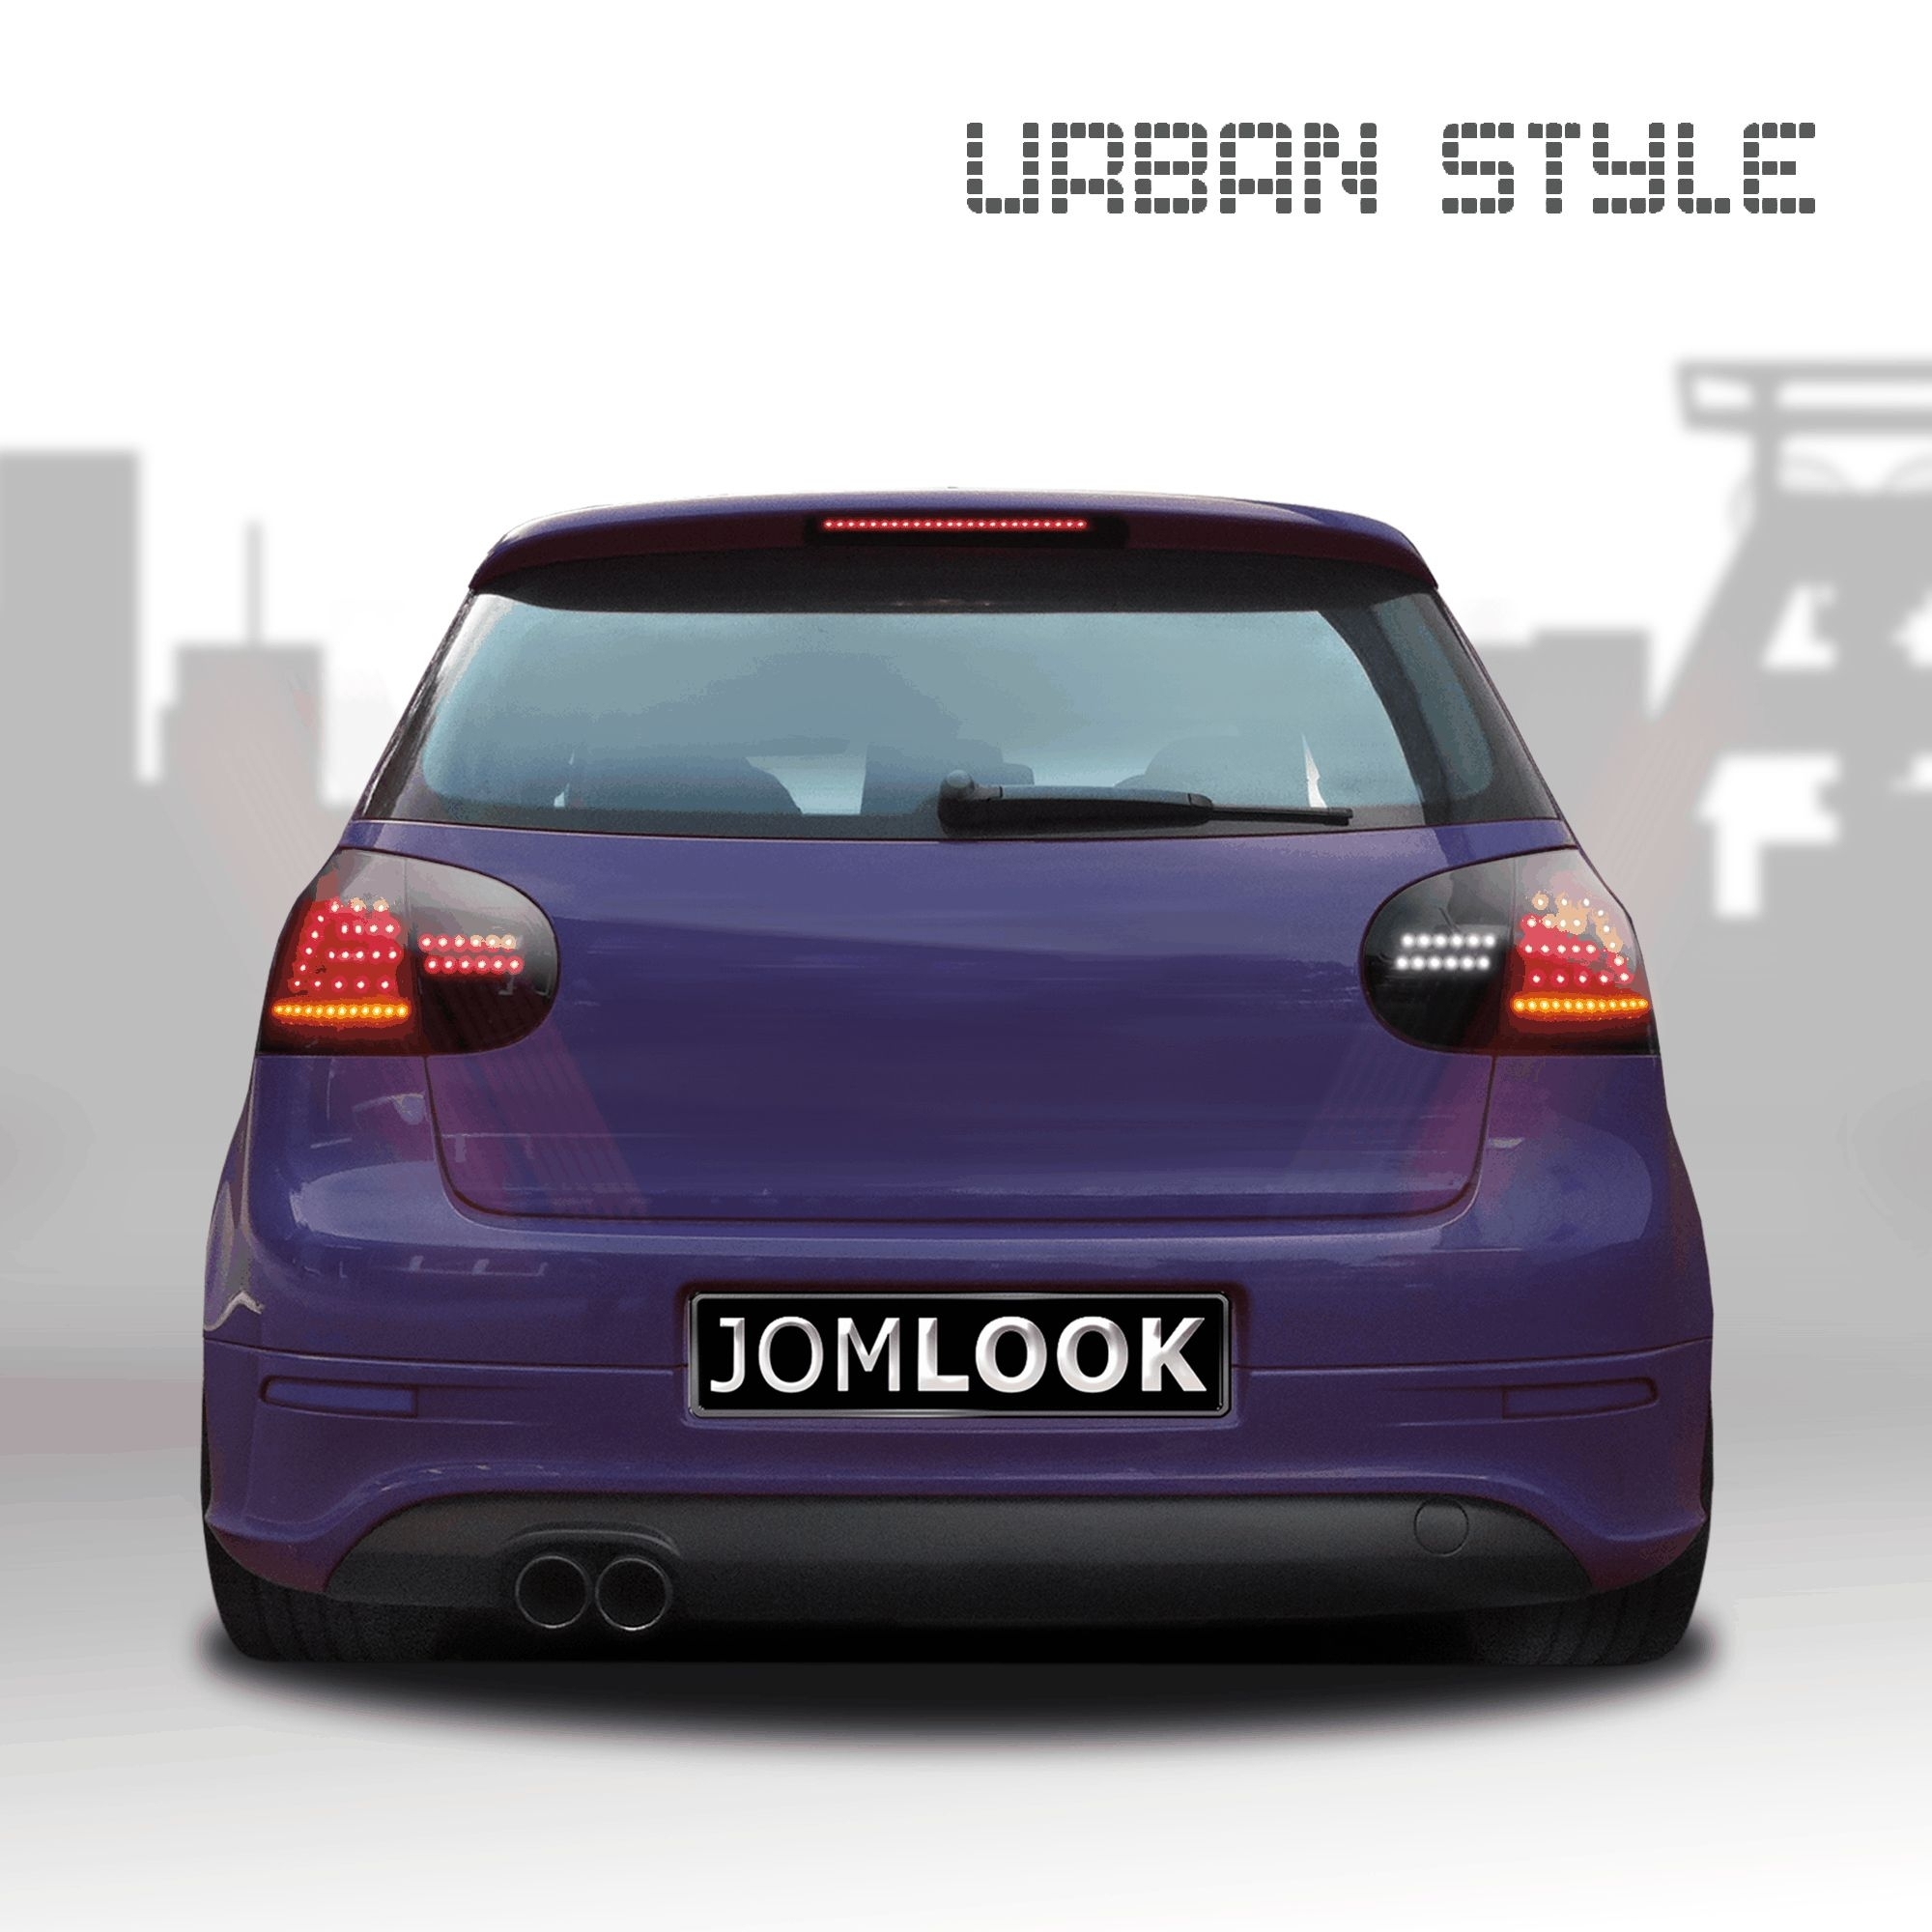 feux arri re led urbanstyle golf 5 03 08 compl tement noir. Black Bedroom Furniture Sets. Home Design Ideas